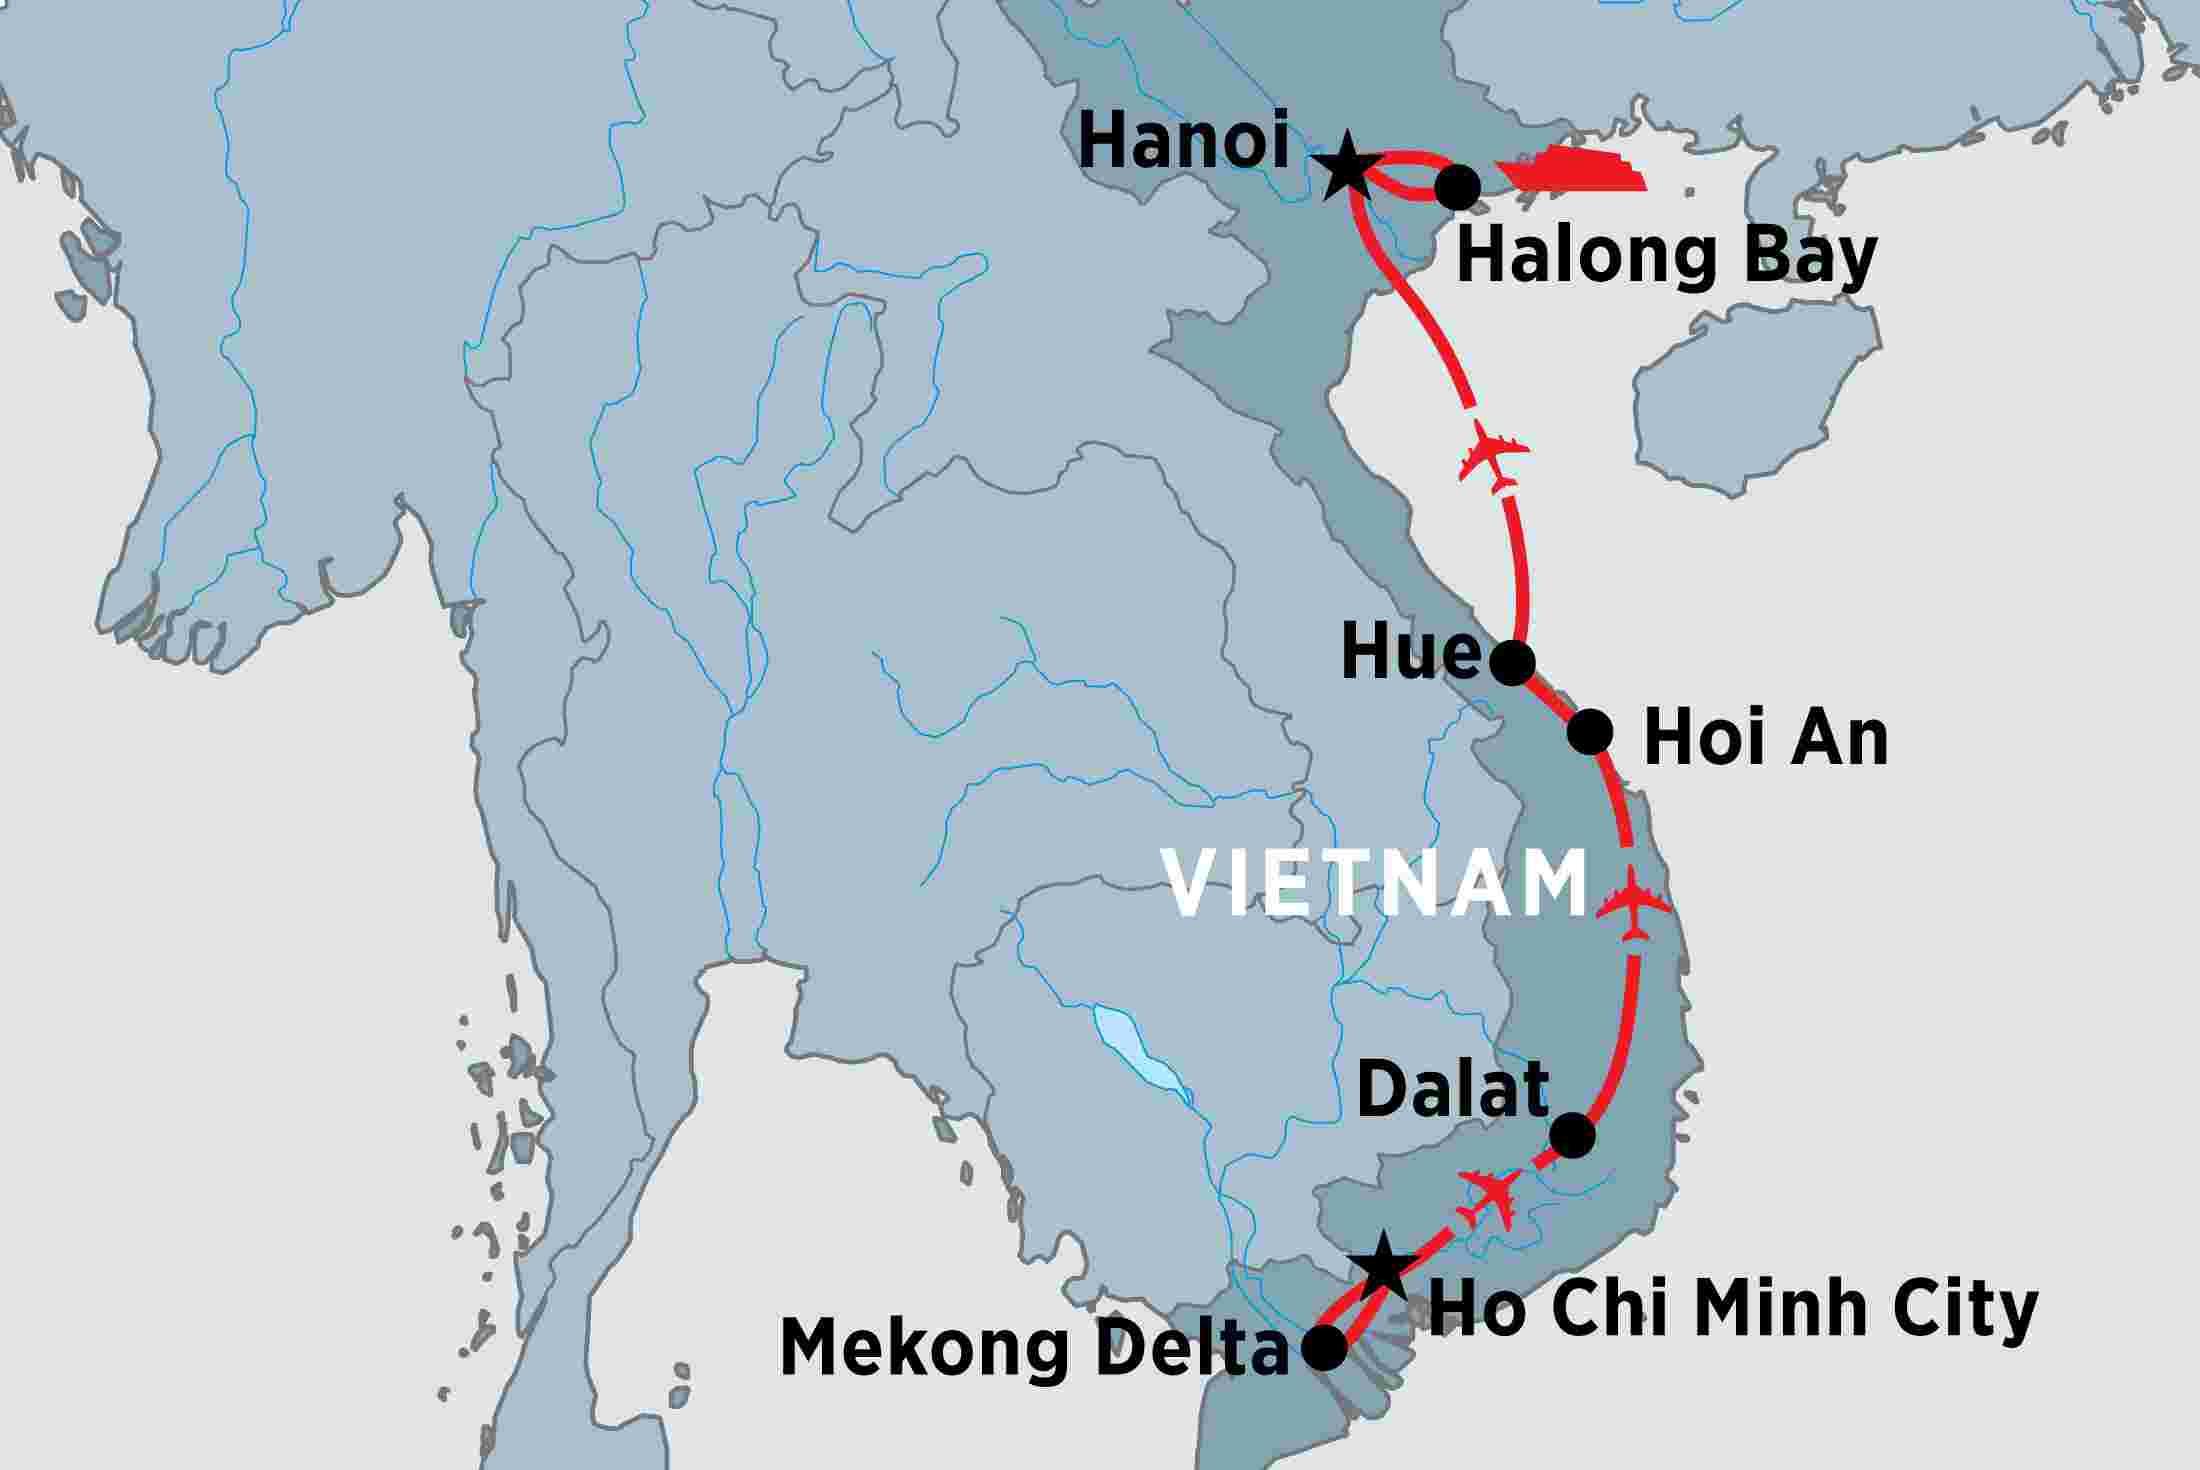 Vietnam Tours, Travel & Trips | Peregrine Adventures EU